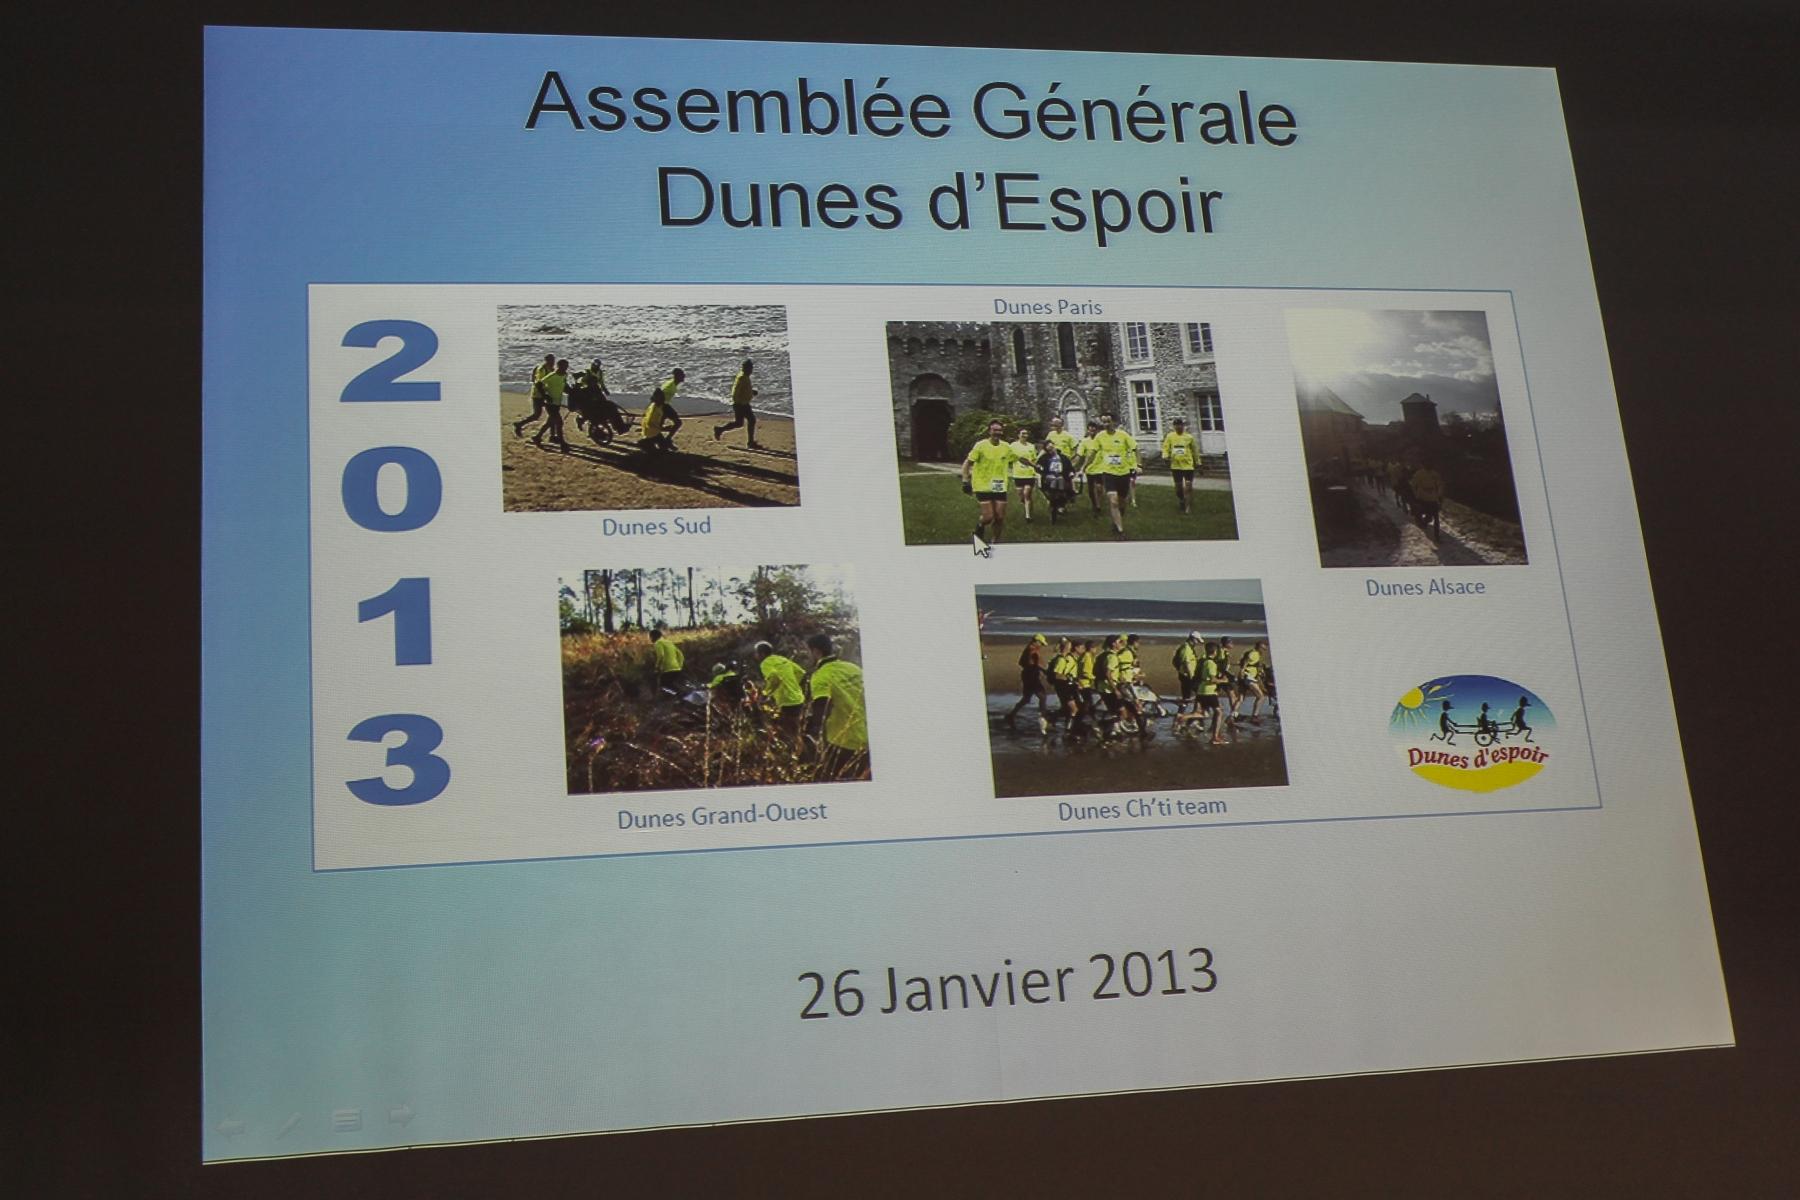 Dunes-Espoir_-_2013-01_-_AG_-_Versailles-2013-01-26_0006